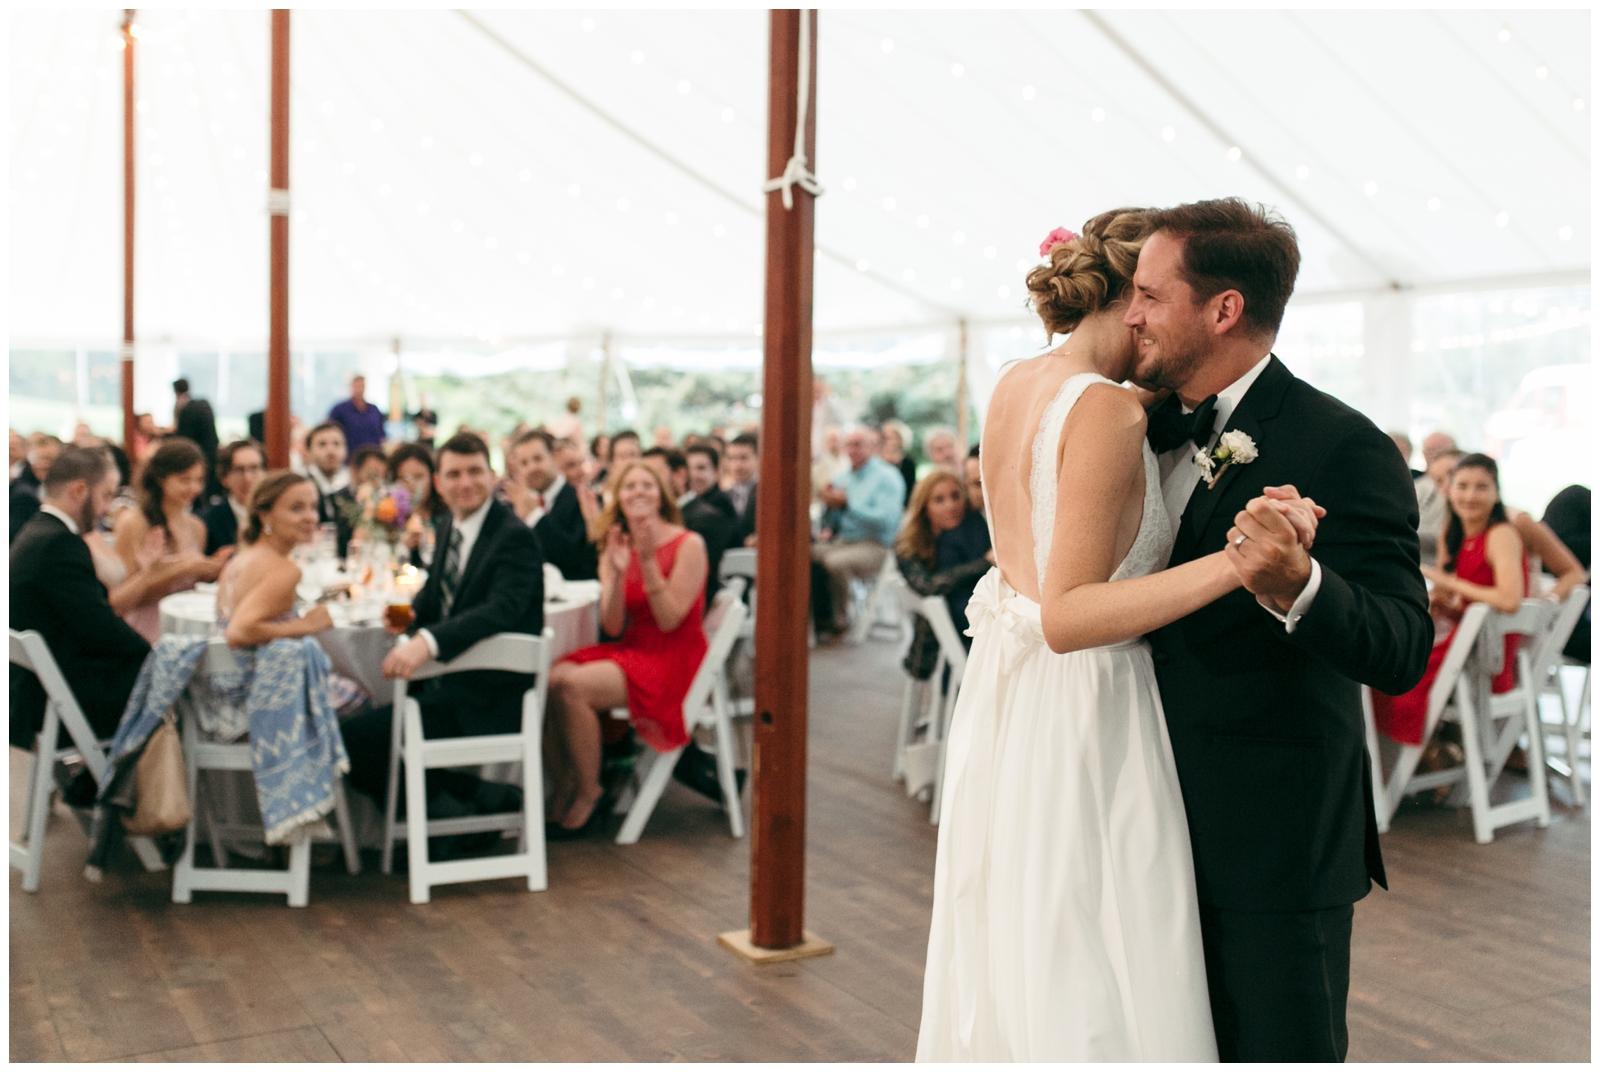 Moraine-Farm-wedding-Bailey-Q-Photo-Massachusetts-wedding-photpgrapher-118.jpg